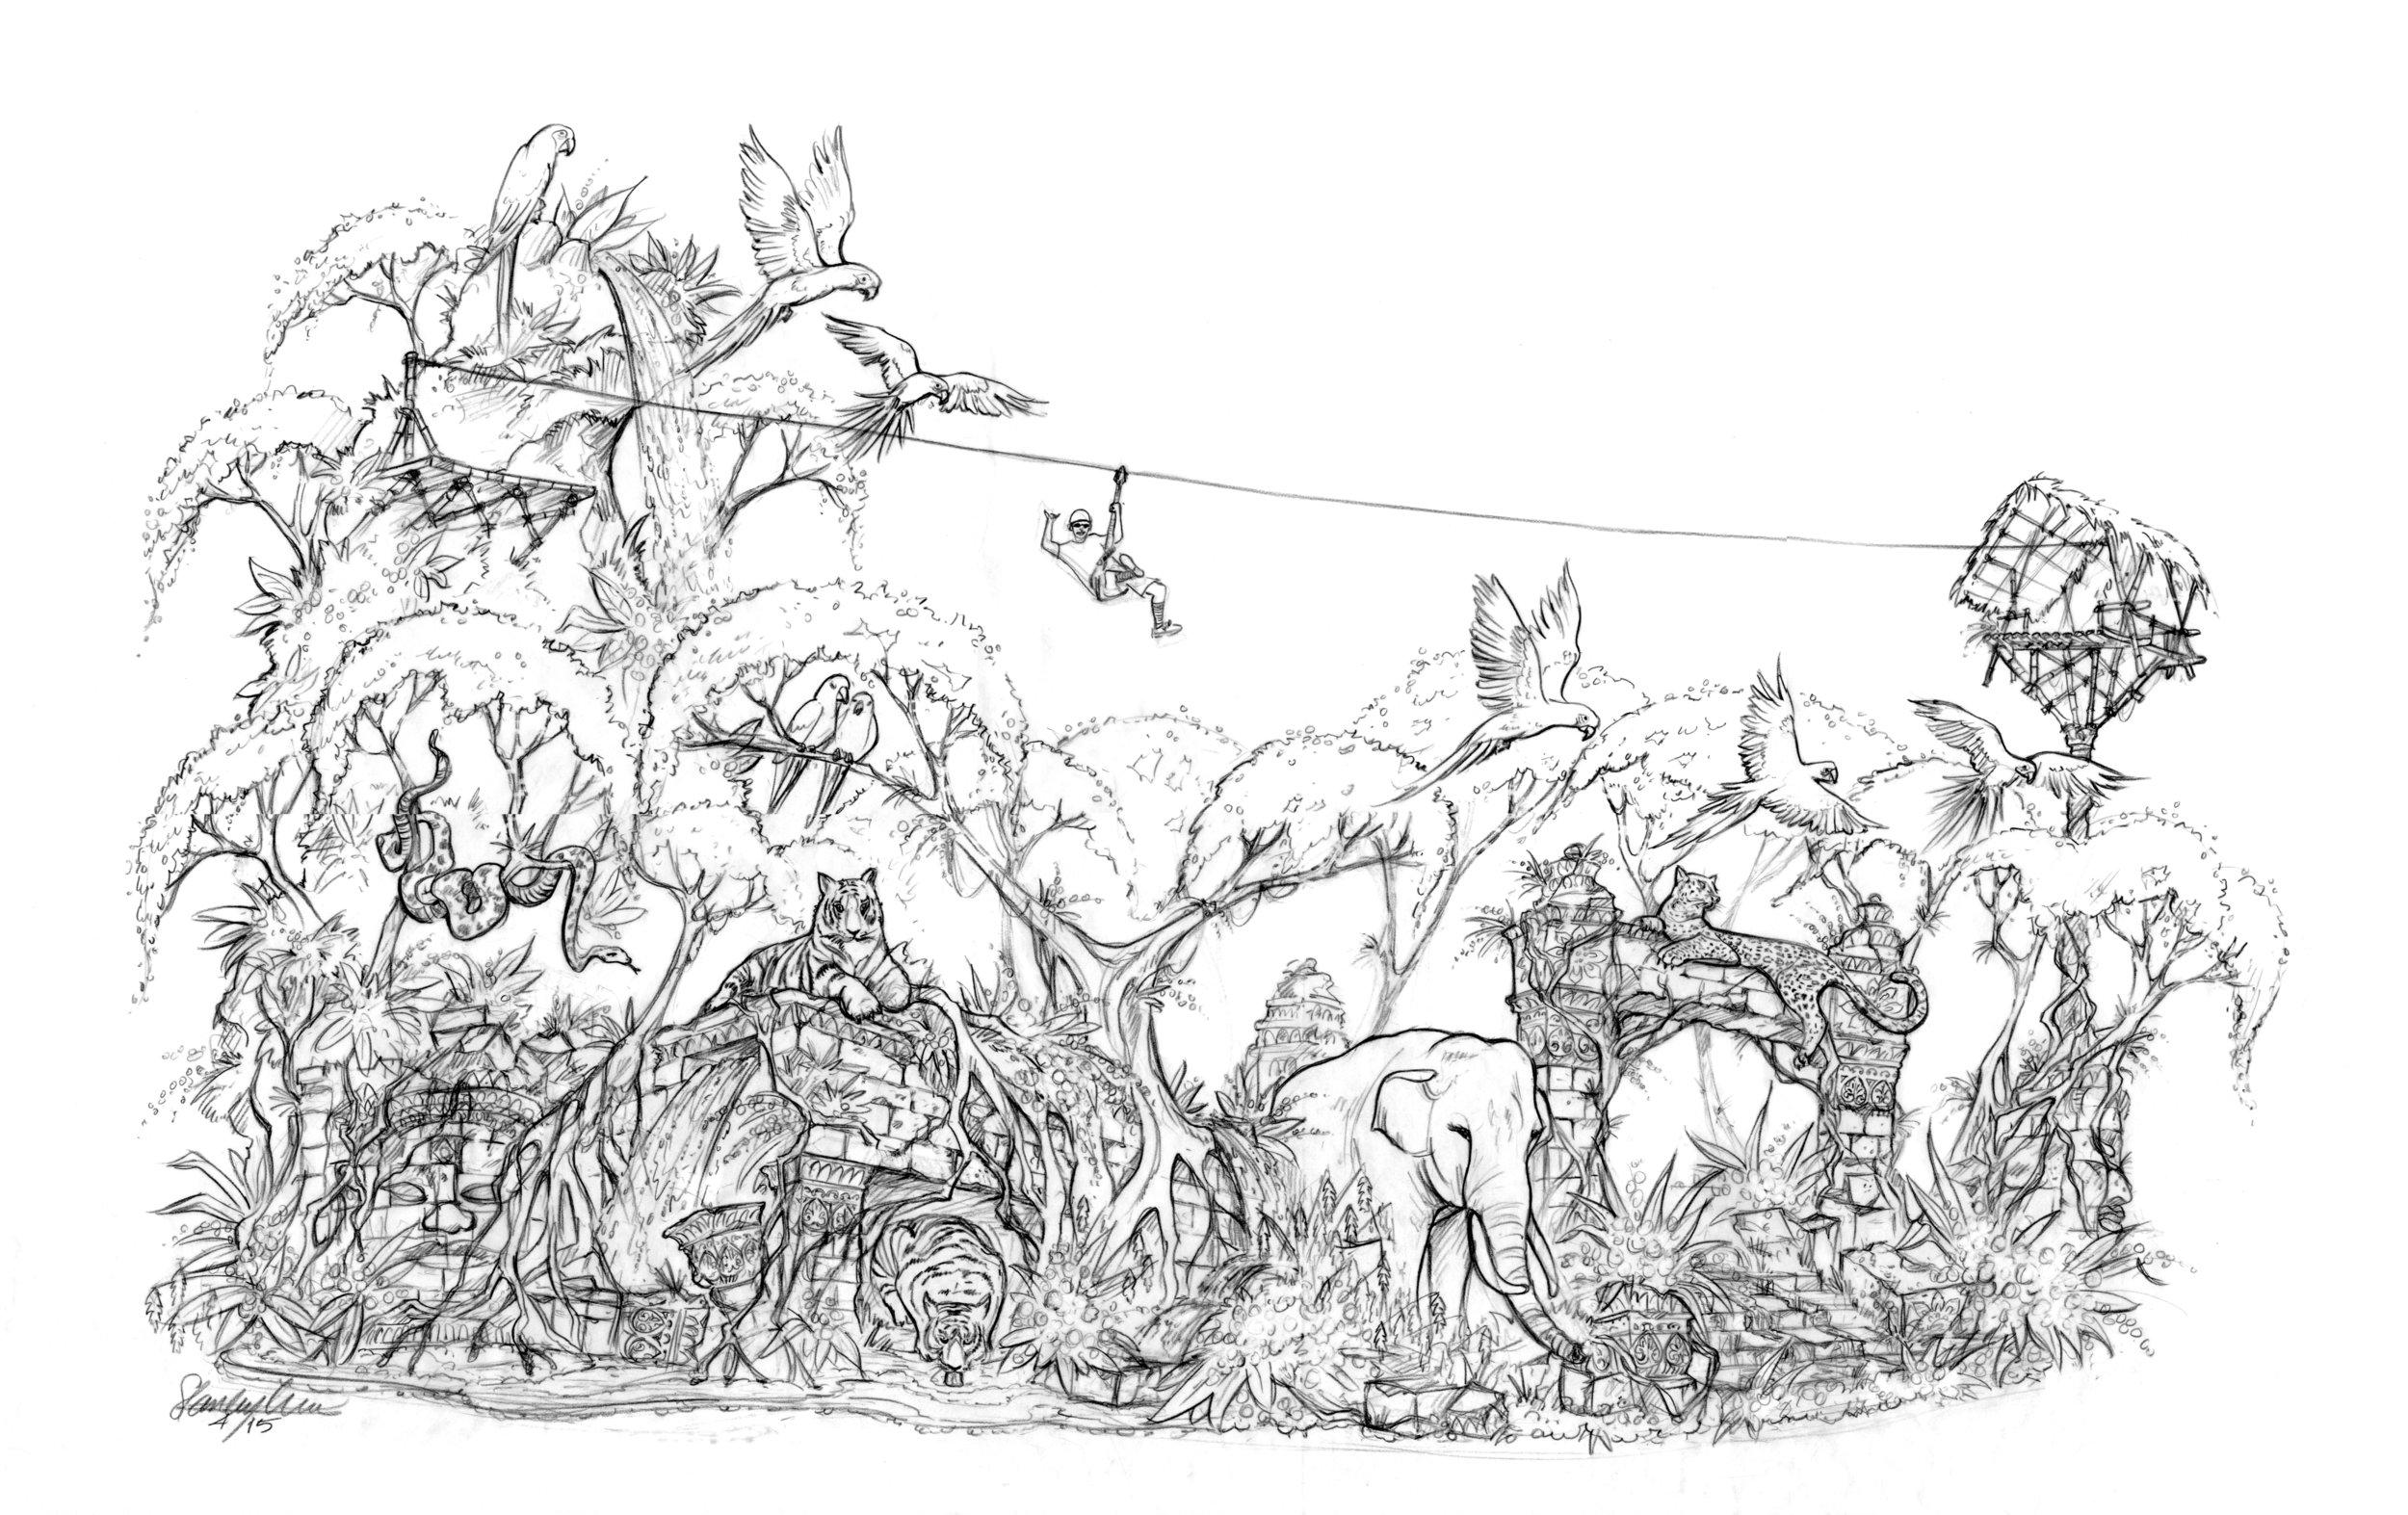 Final Design sketch